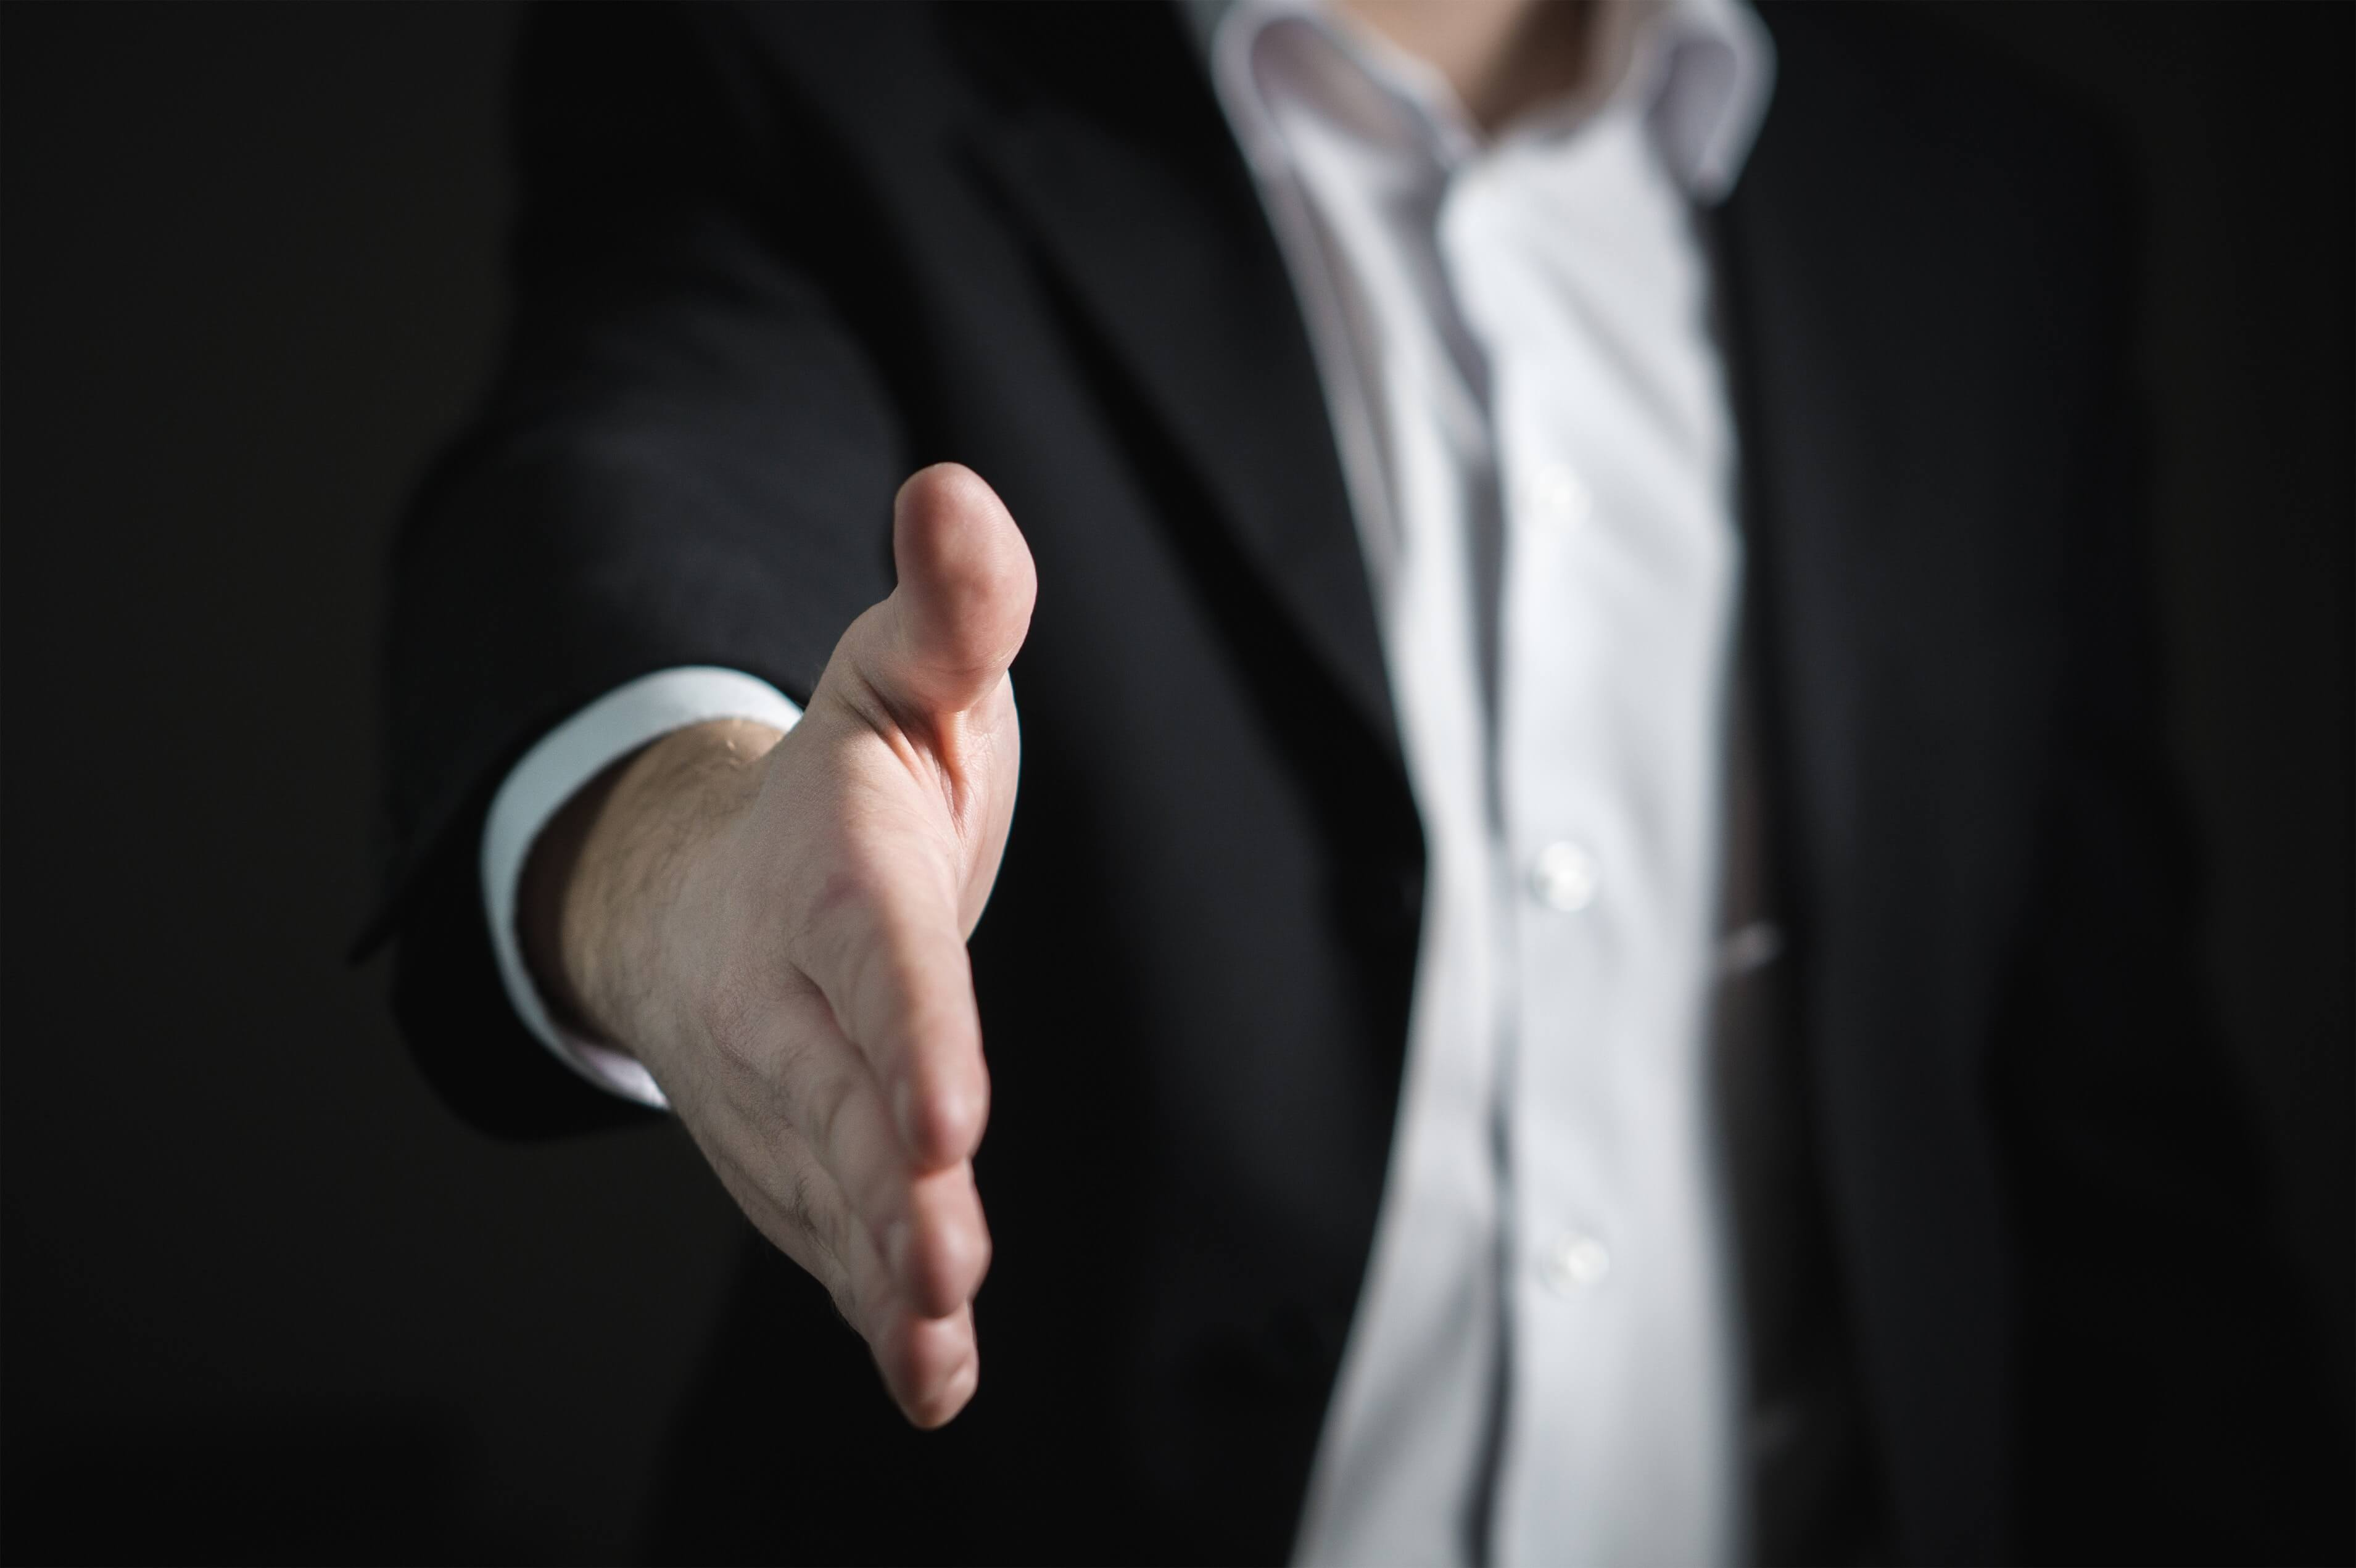 Business Sales - Informed Financial Planning